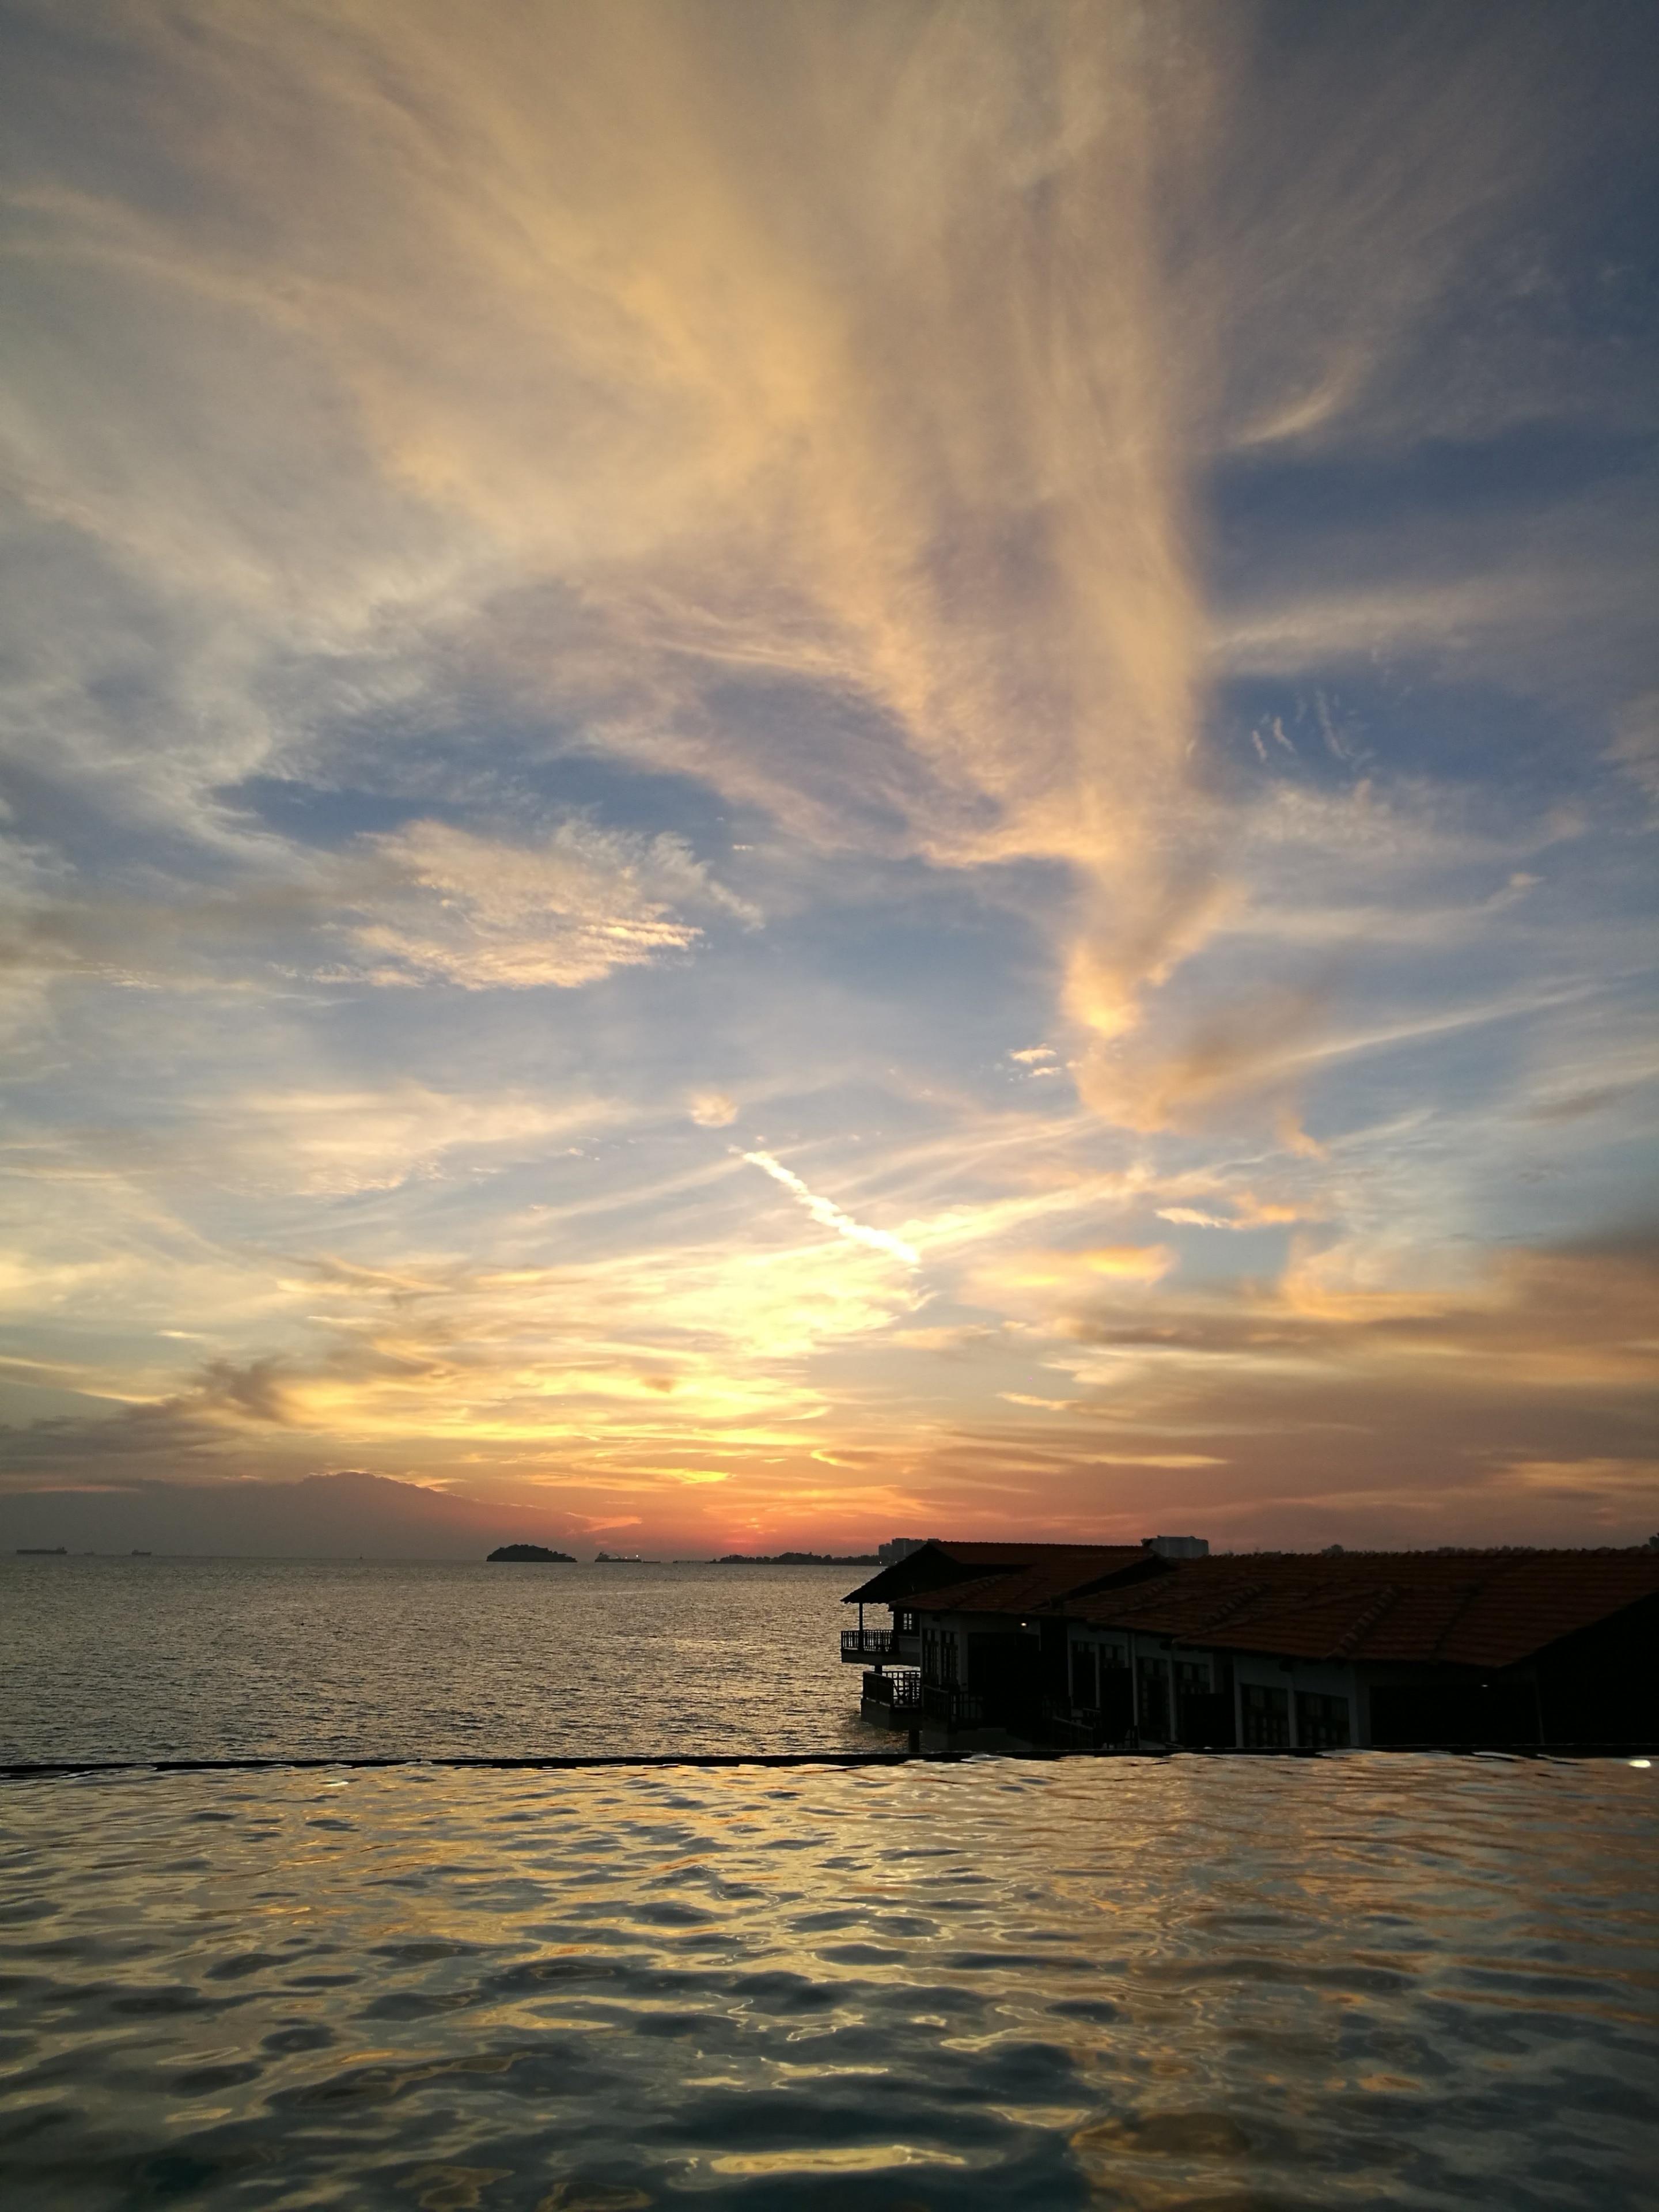 Negeri Sembilan, Malásia